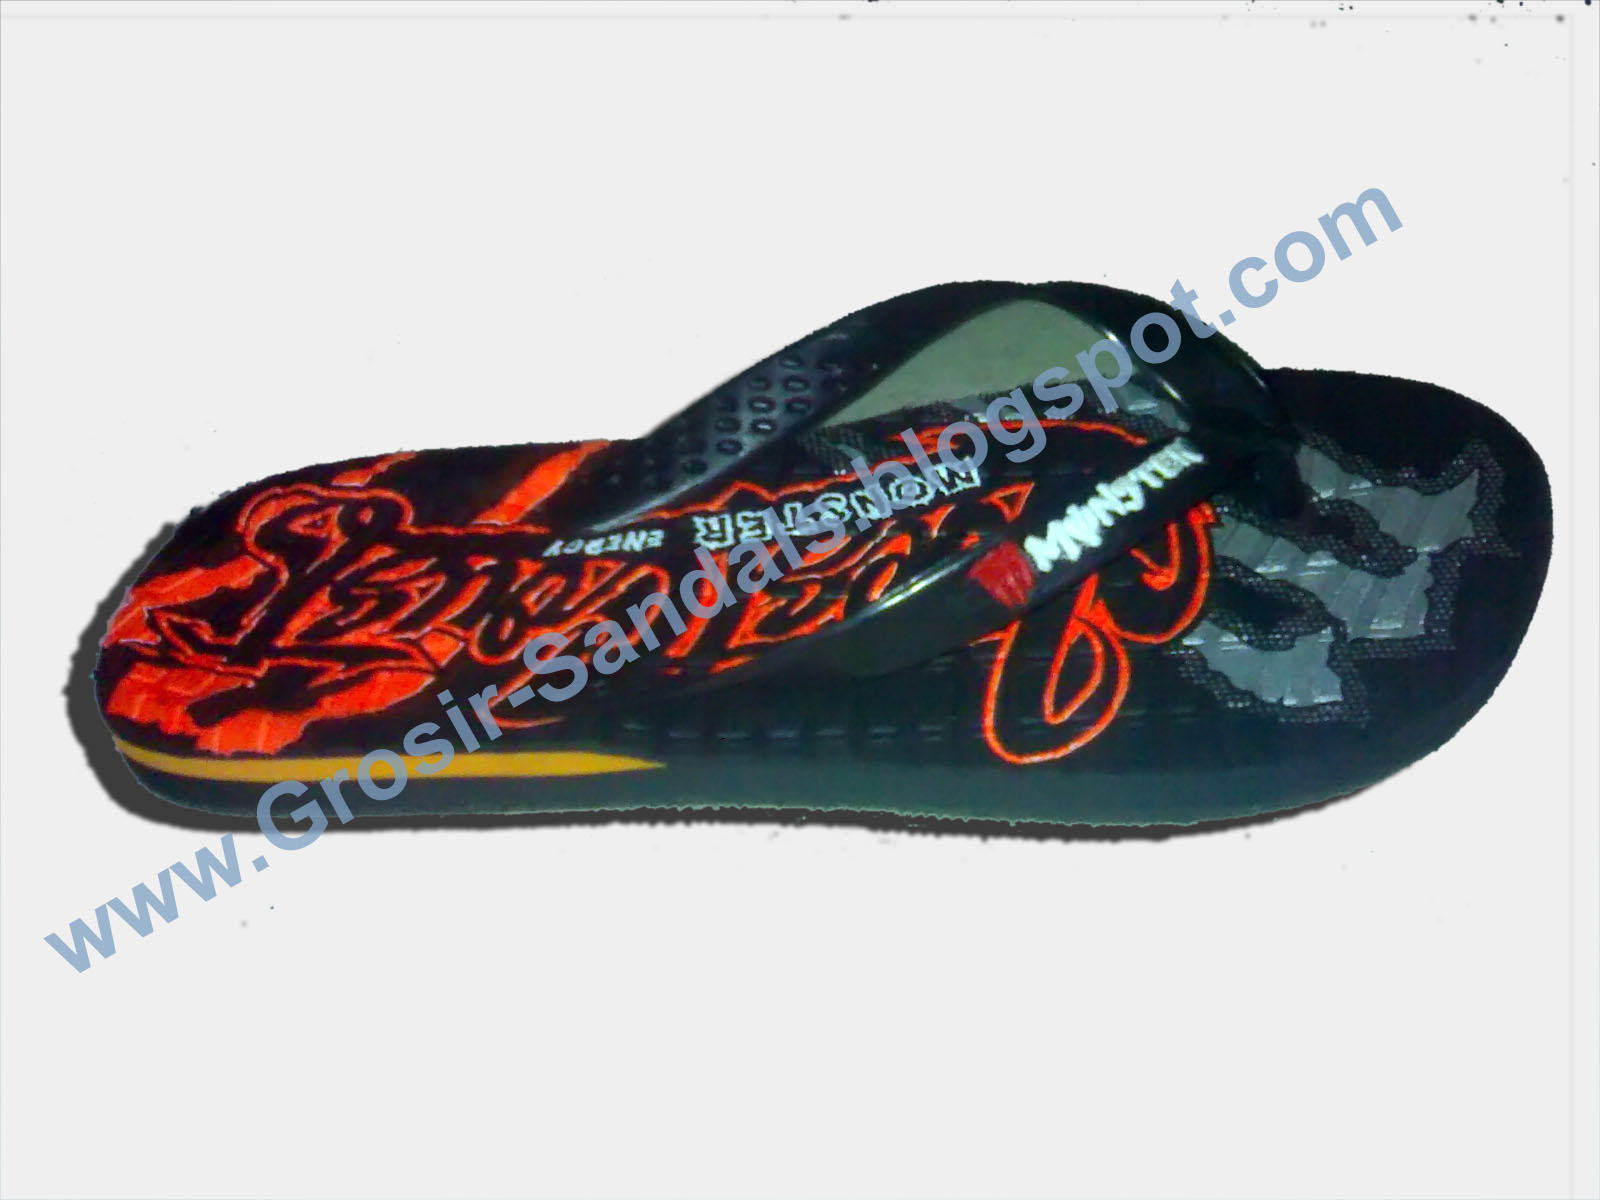 Agen Sandal Grosir Sandal Jual Sandal Pabrik Sandal